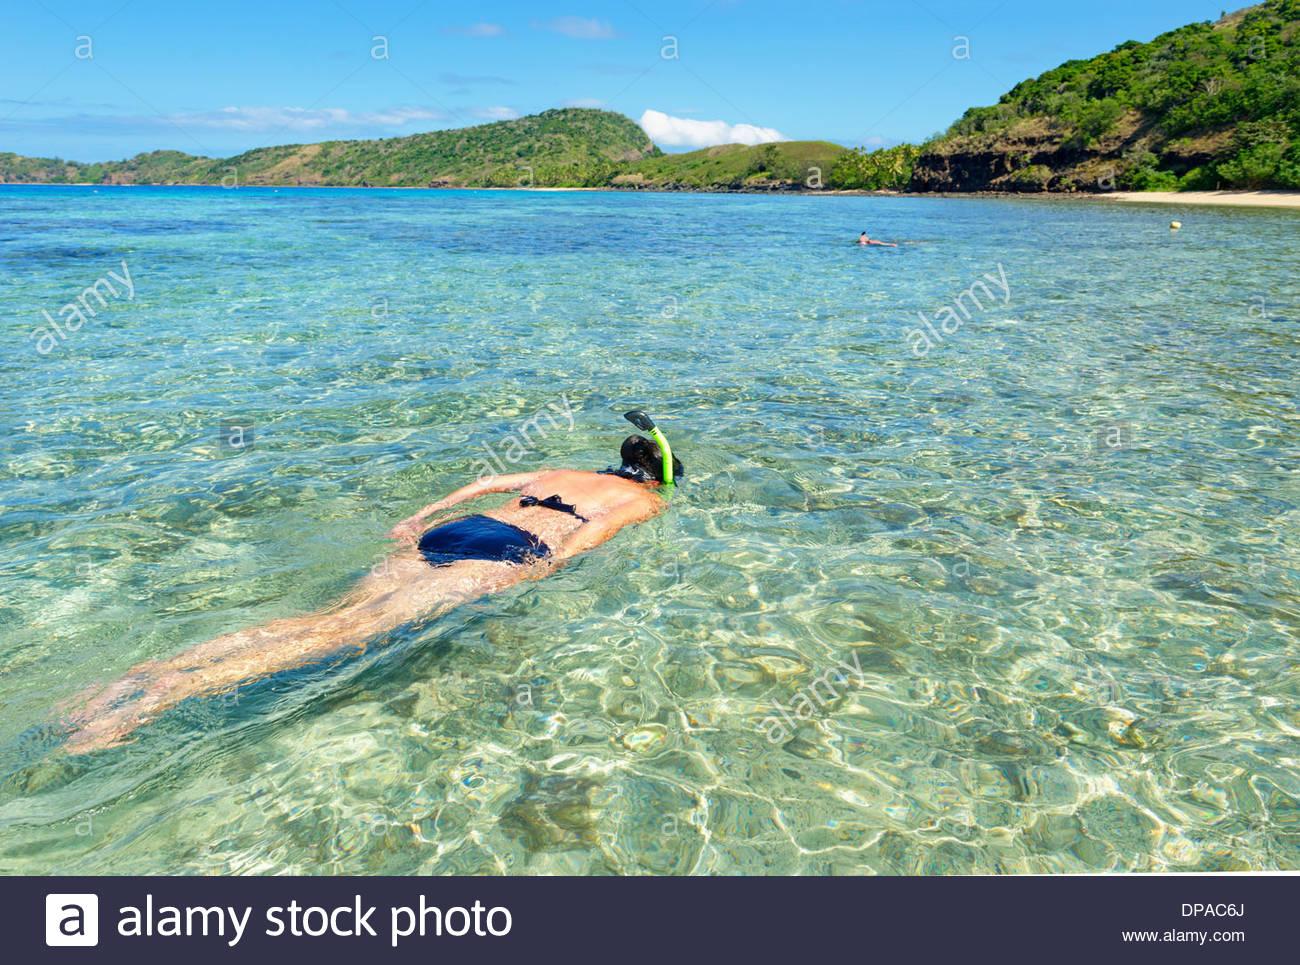 Femme en apnée, Yasawa island group, Fiji, South Pacific Islands Photo Stock